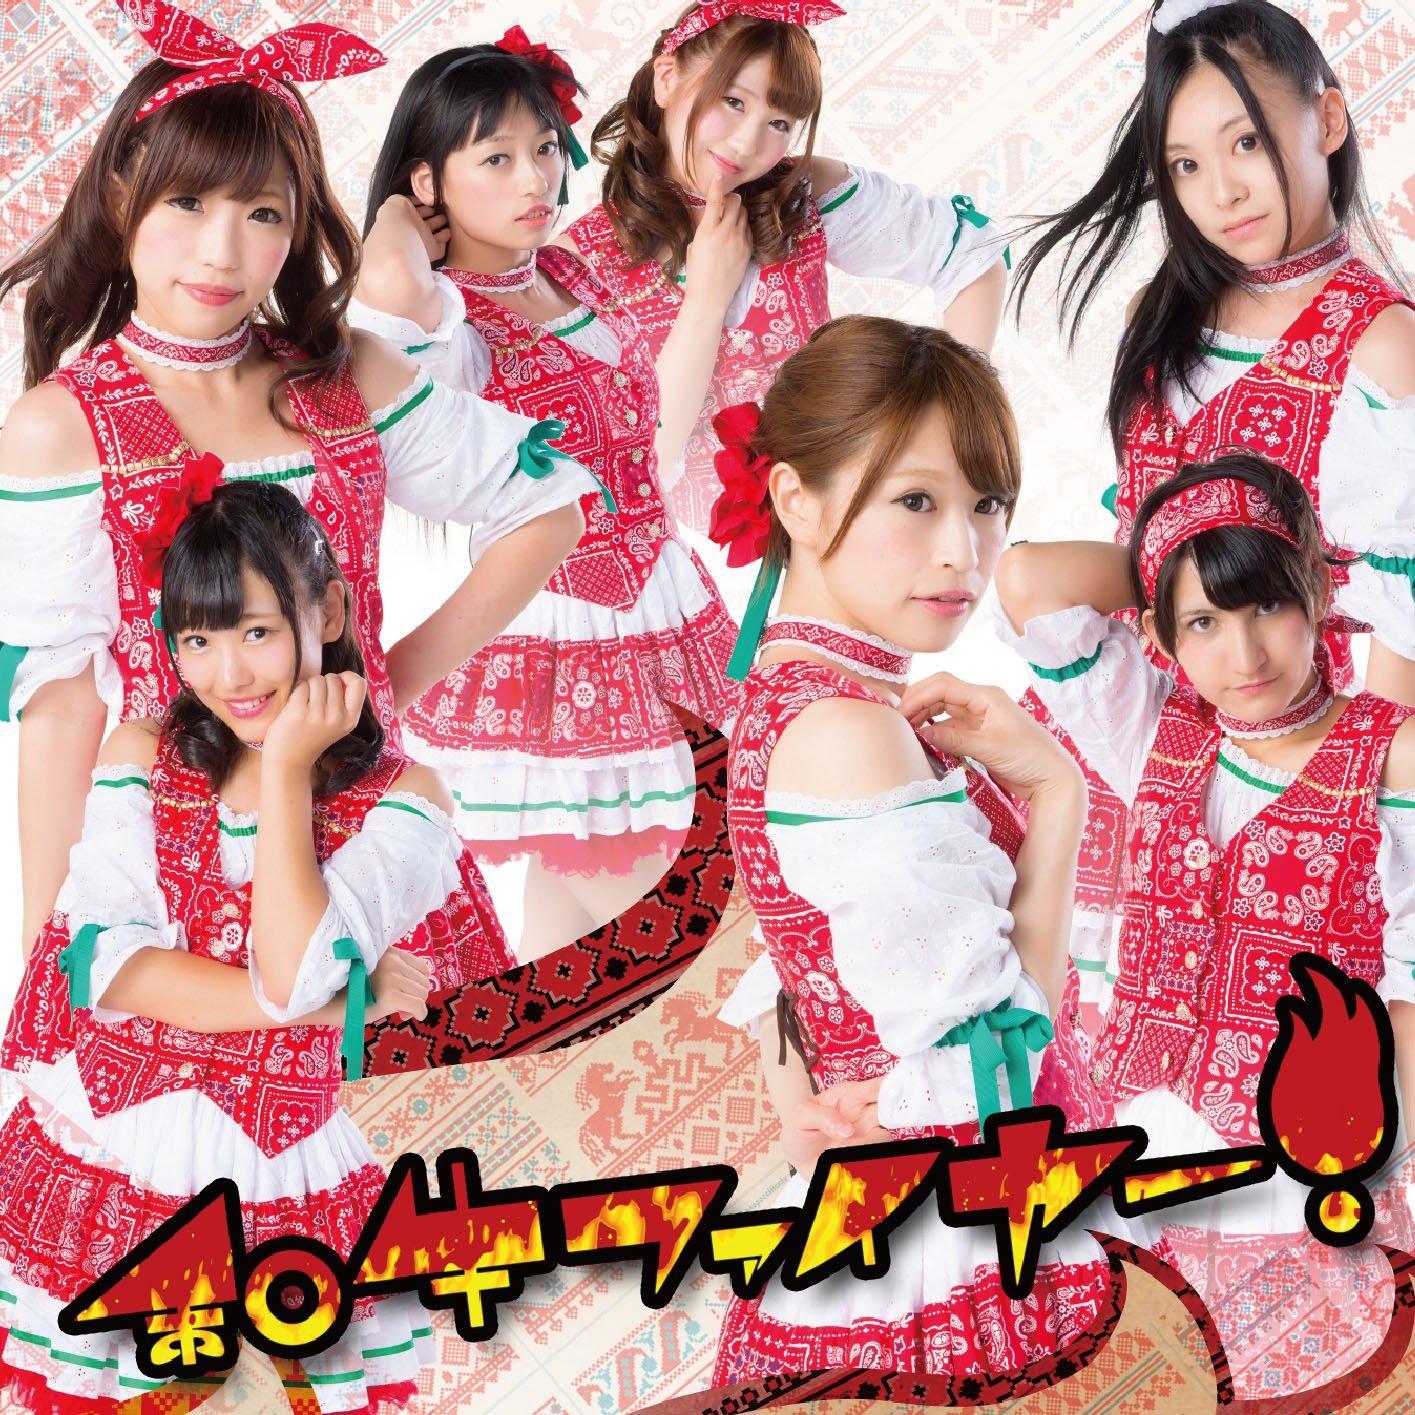 20190110.1240.44 Tochiotome25 - Wagyuu Fire! cover.jpg